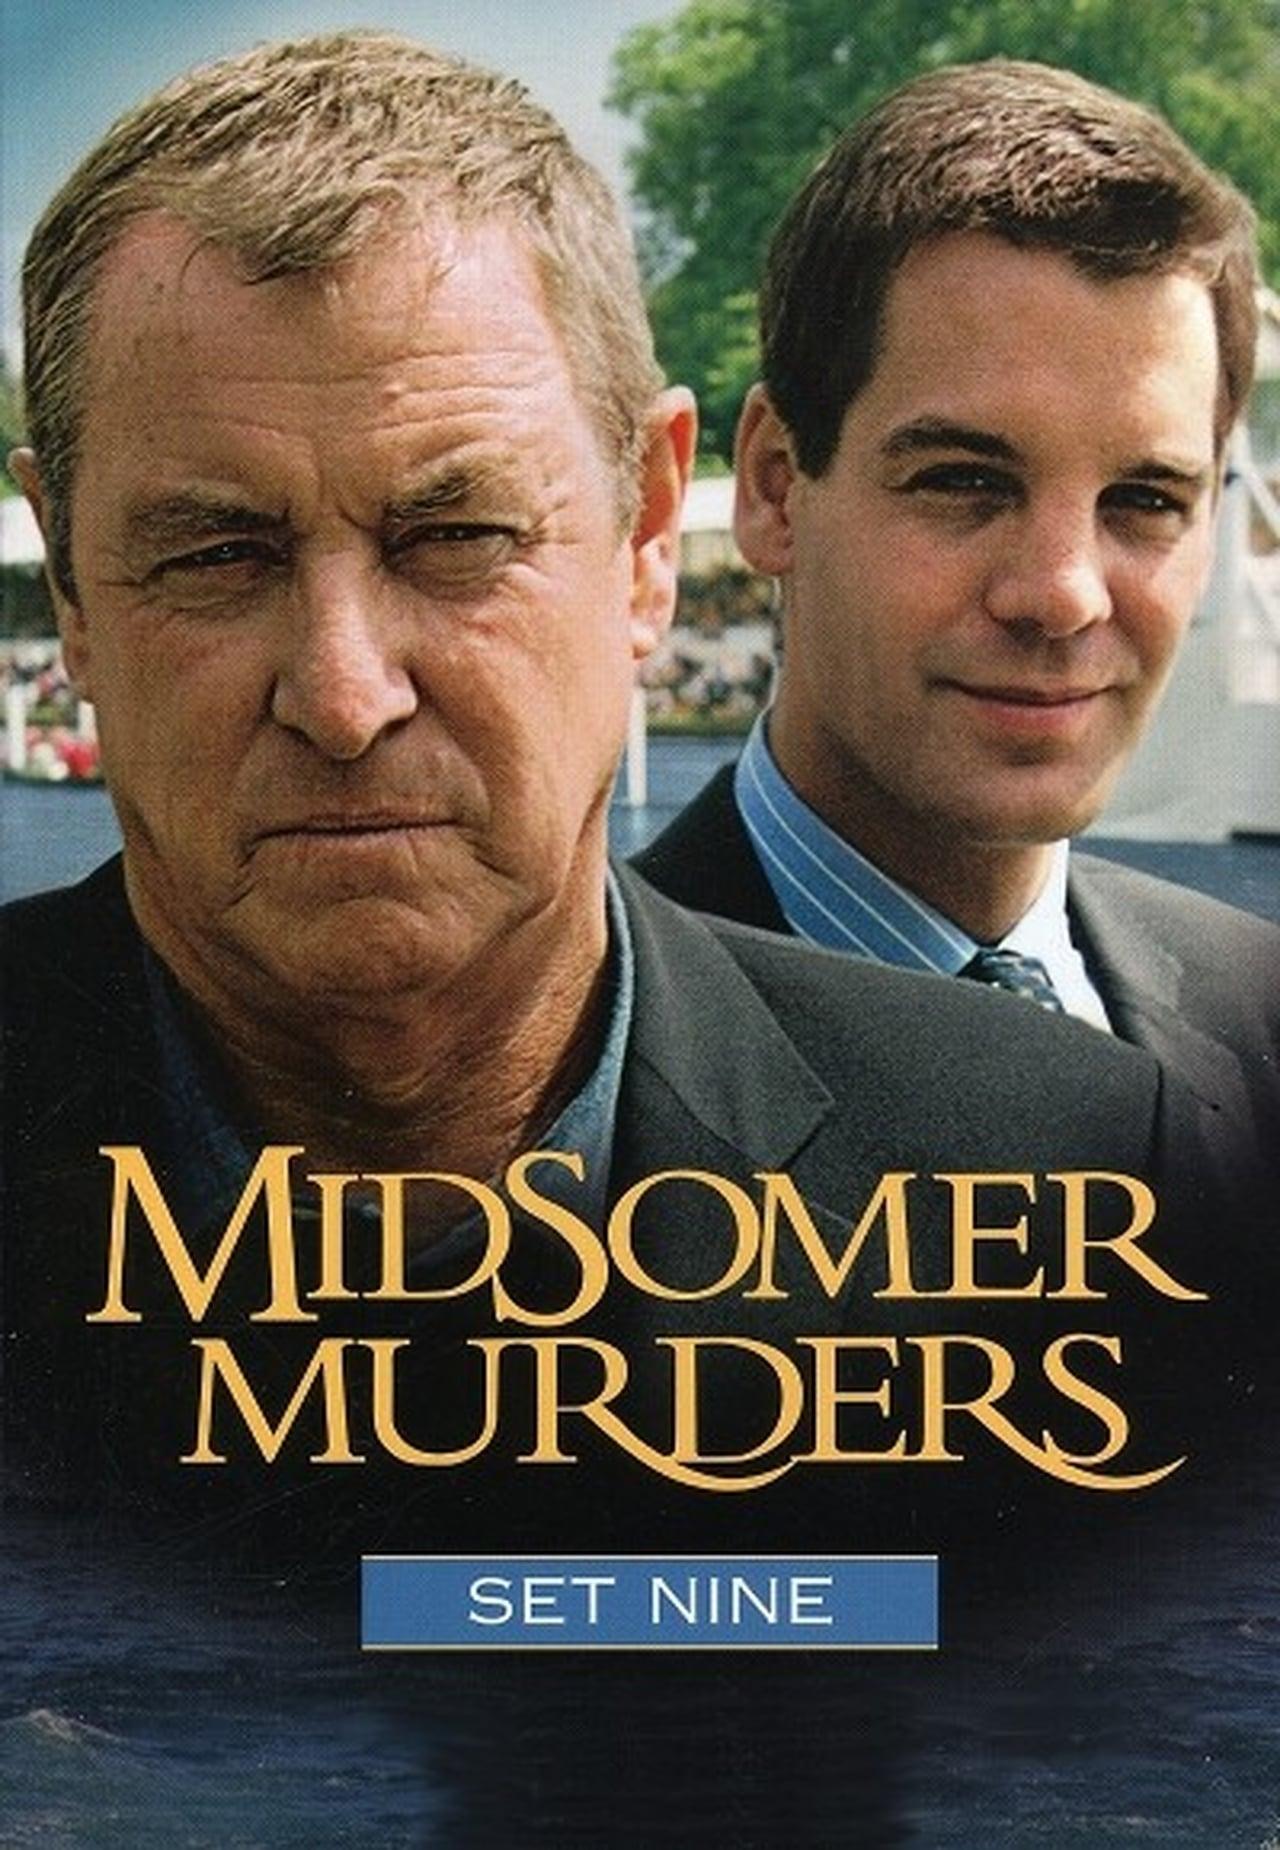 Putlocker Midsomer Murders Season 9 (2005)